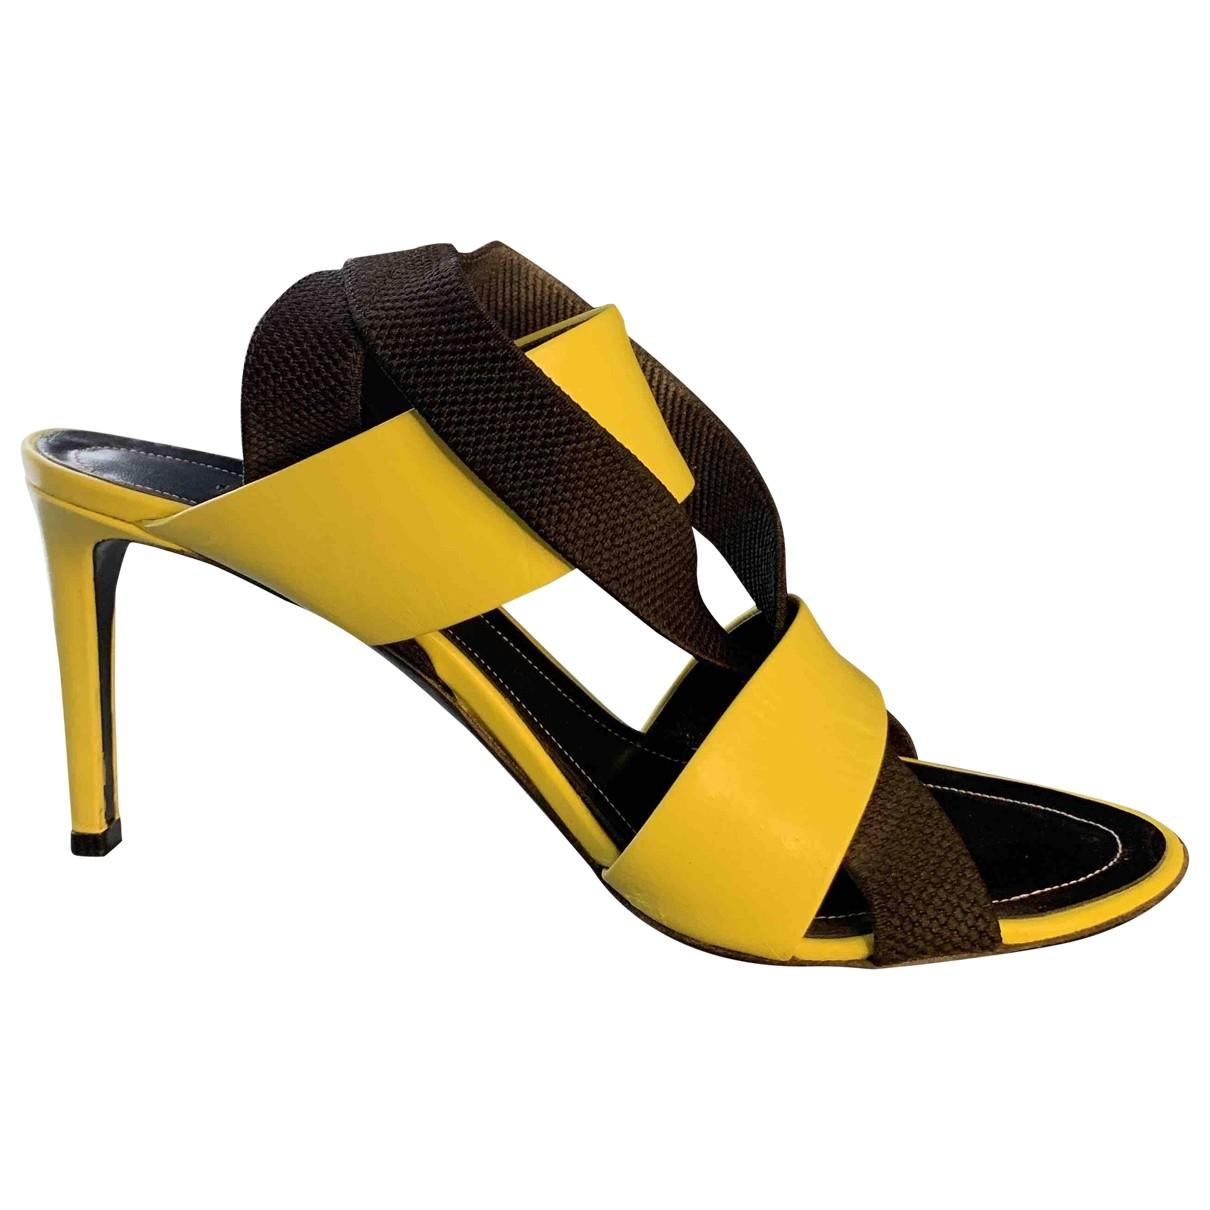 Balenciaga \N Multicolour Leather Sandals for Women 38.5 EU